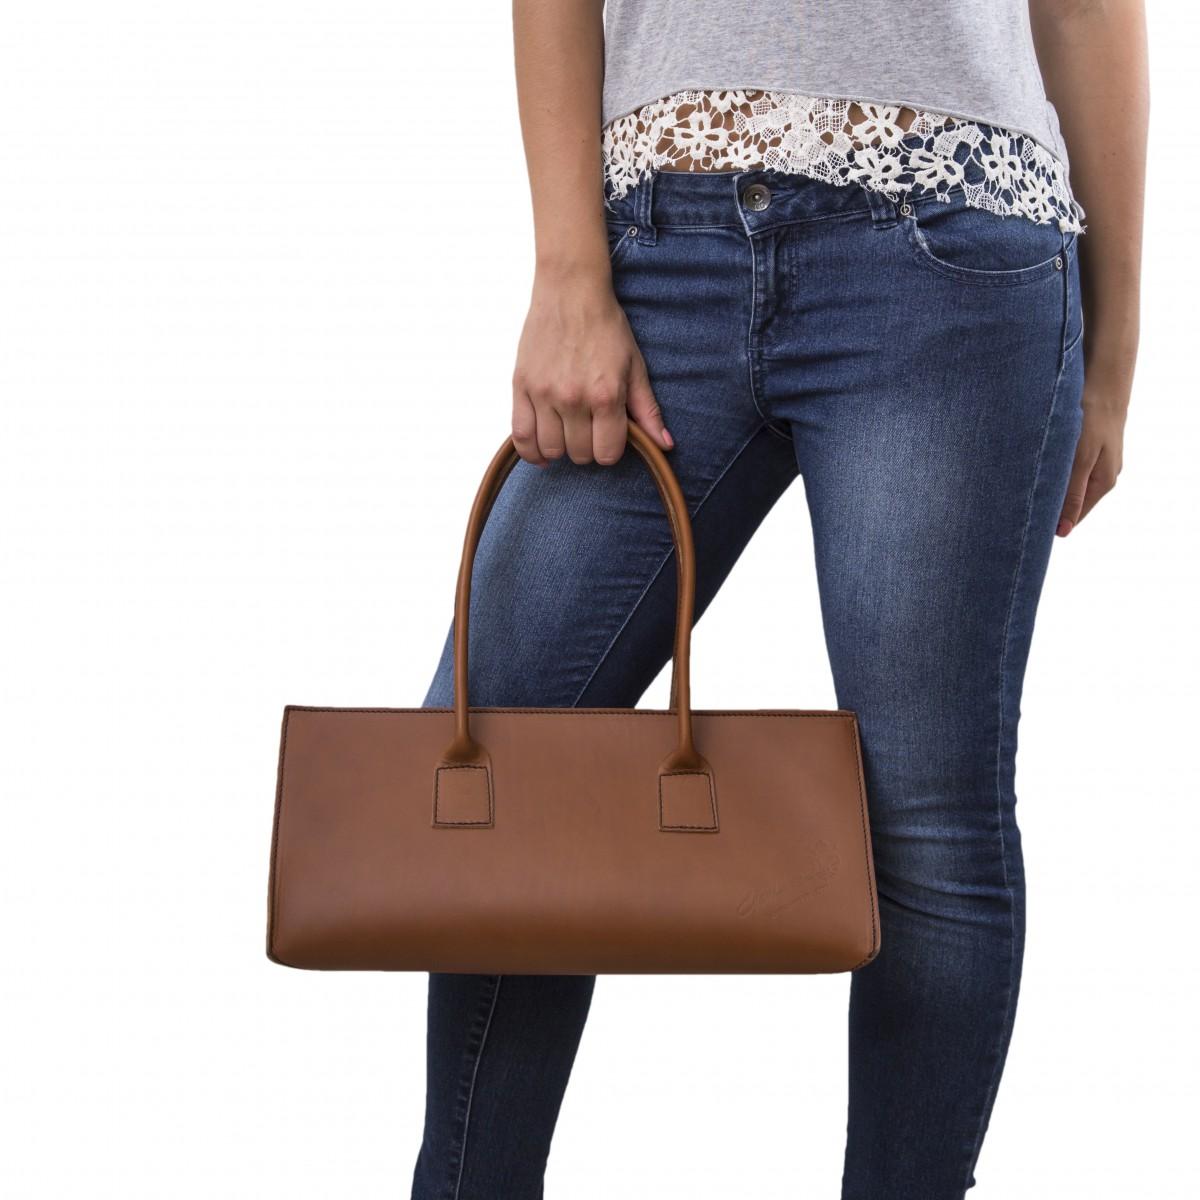 hand gefertigte damen handtasche aus braunem leder gianluca das leder handwerker. Black Bedroom Furniture Sets. Home Design Ideas